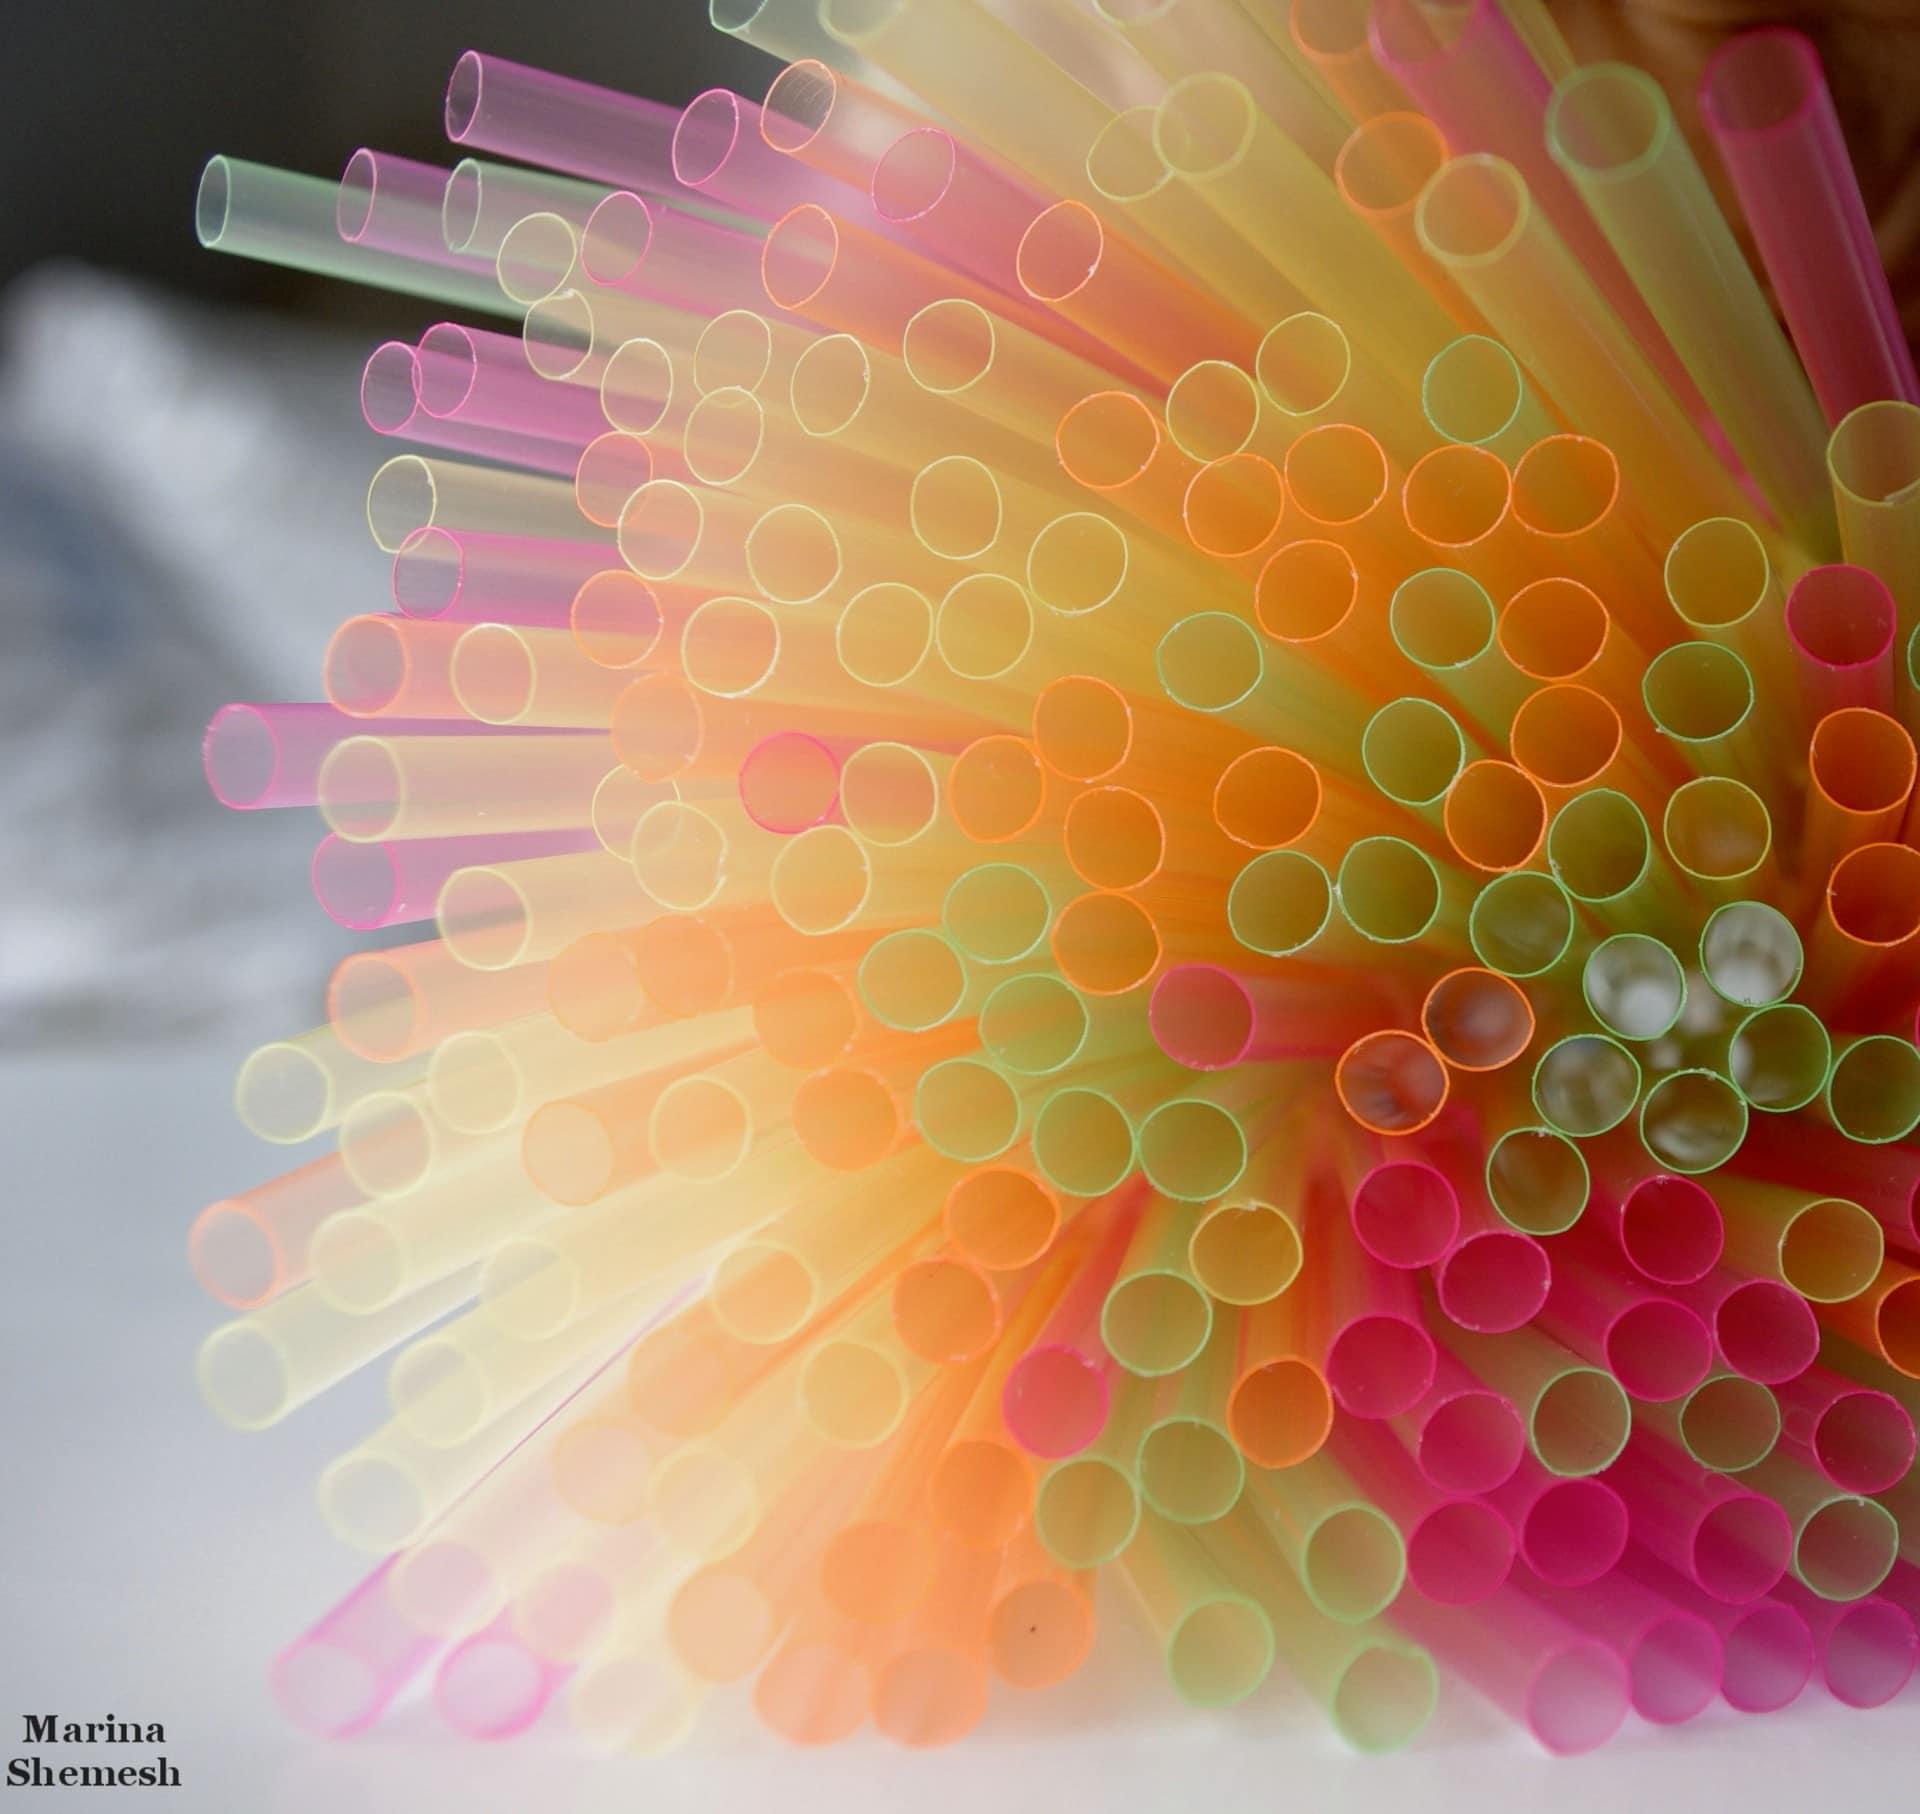 Plastic – Alternatives to single use items